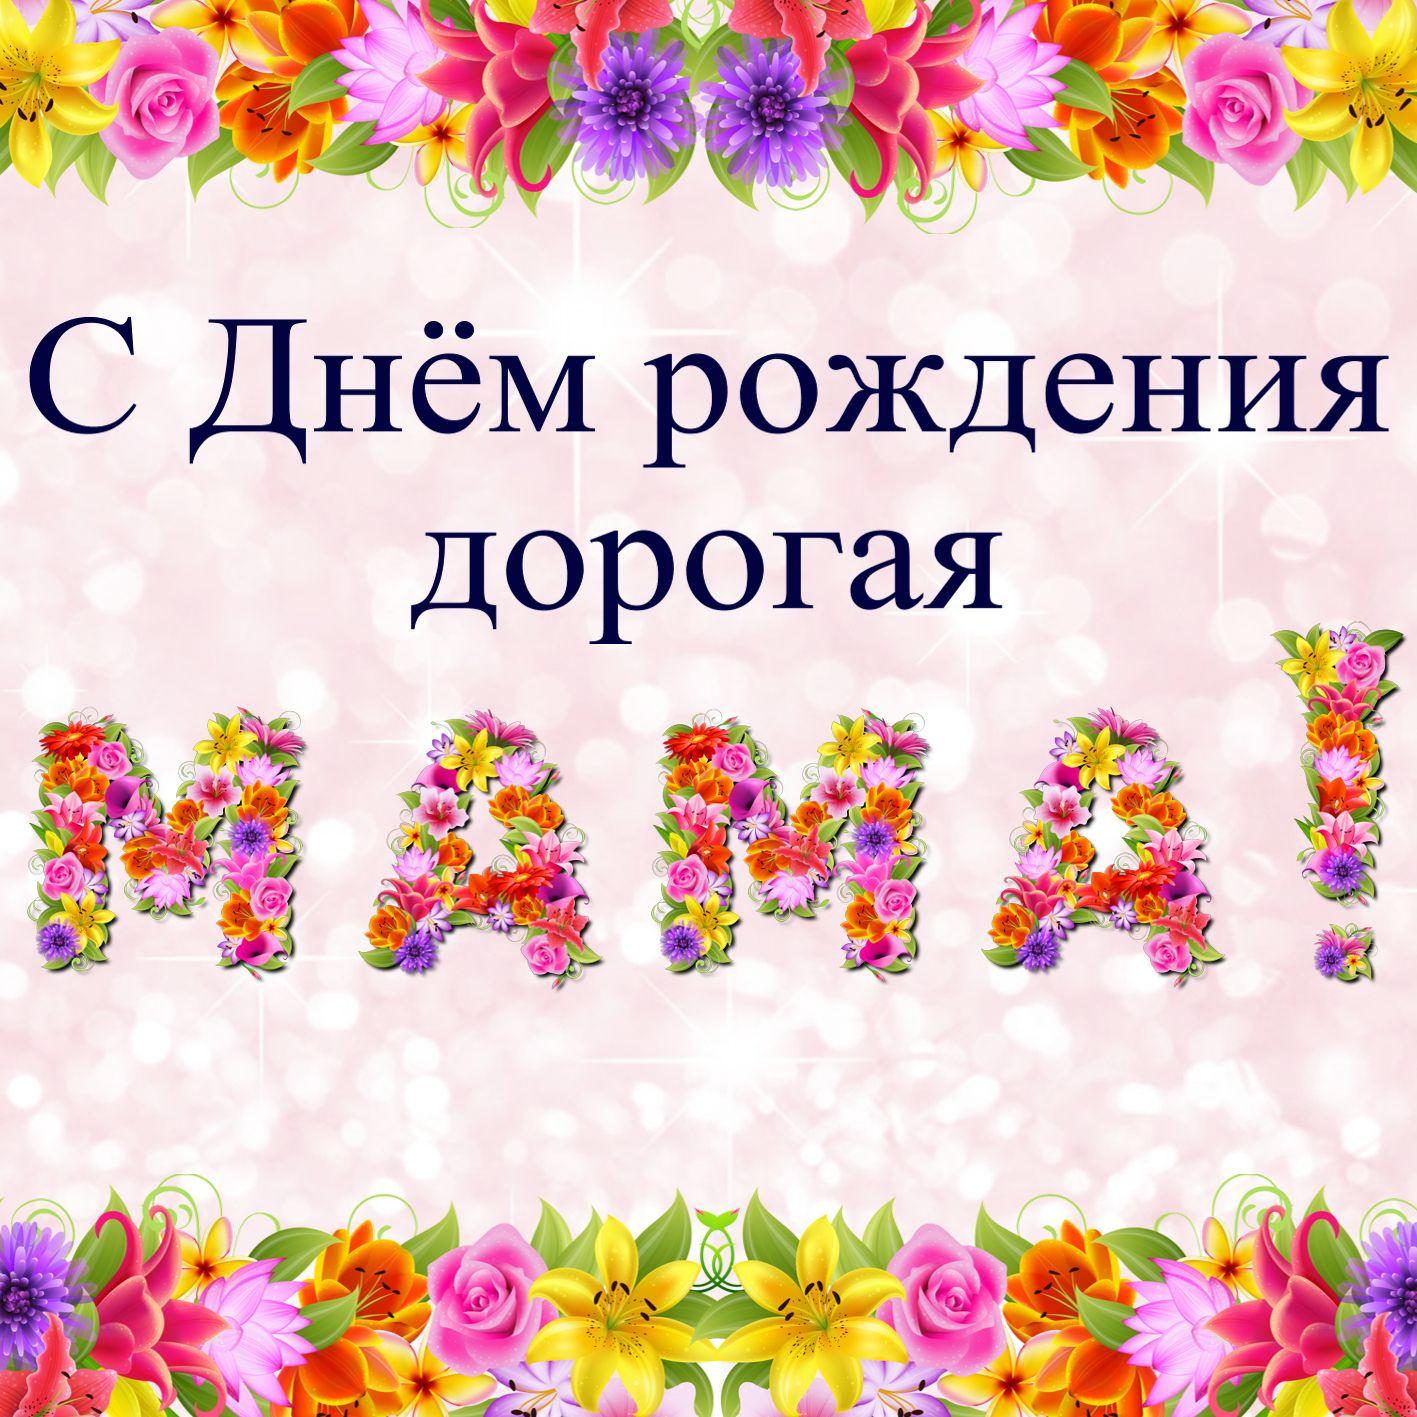 Поздравления маме от дочери, с днем рождения маме 67